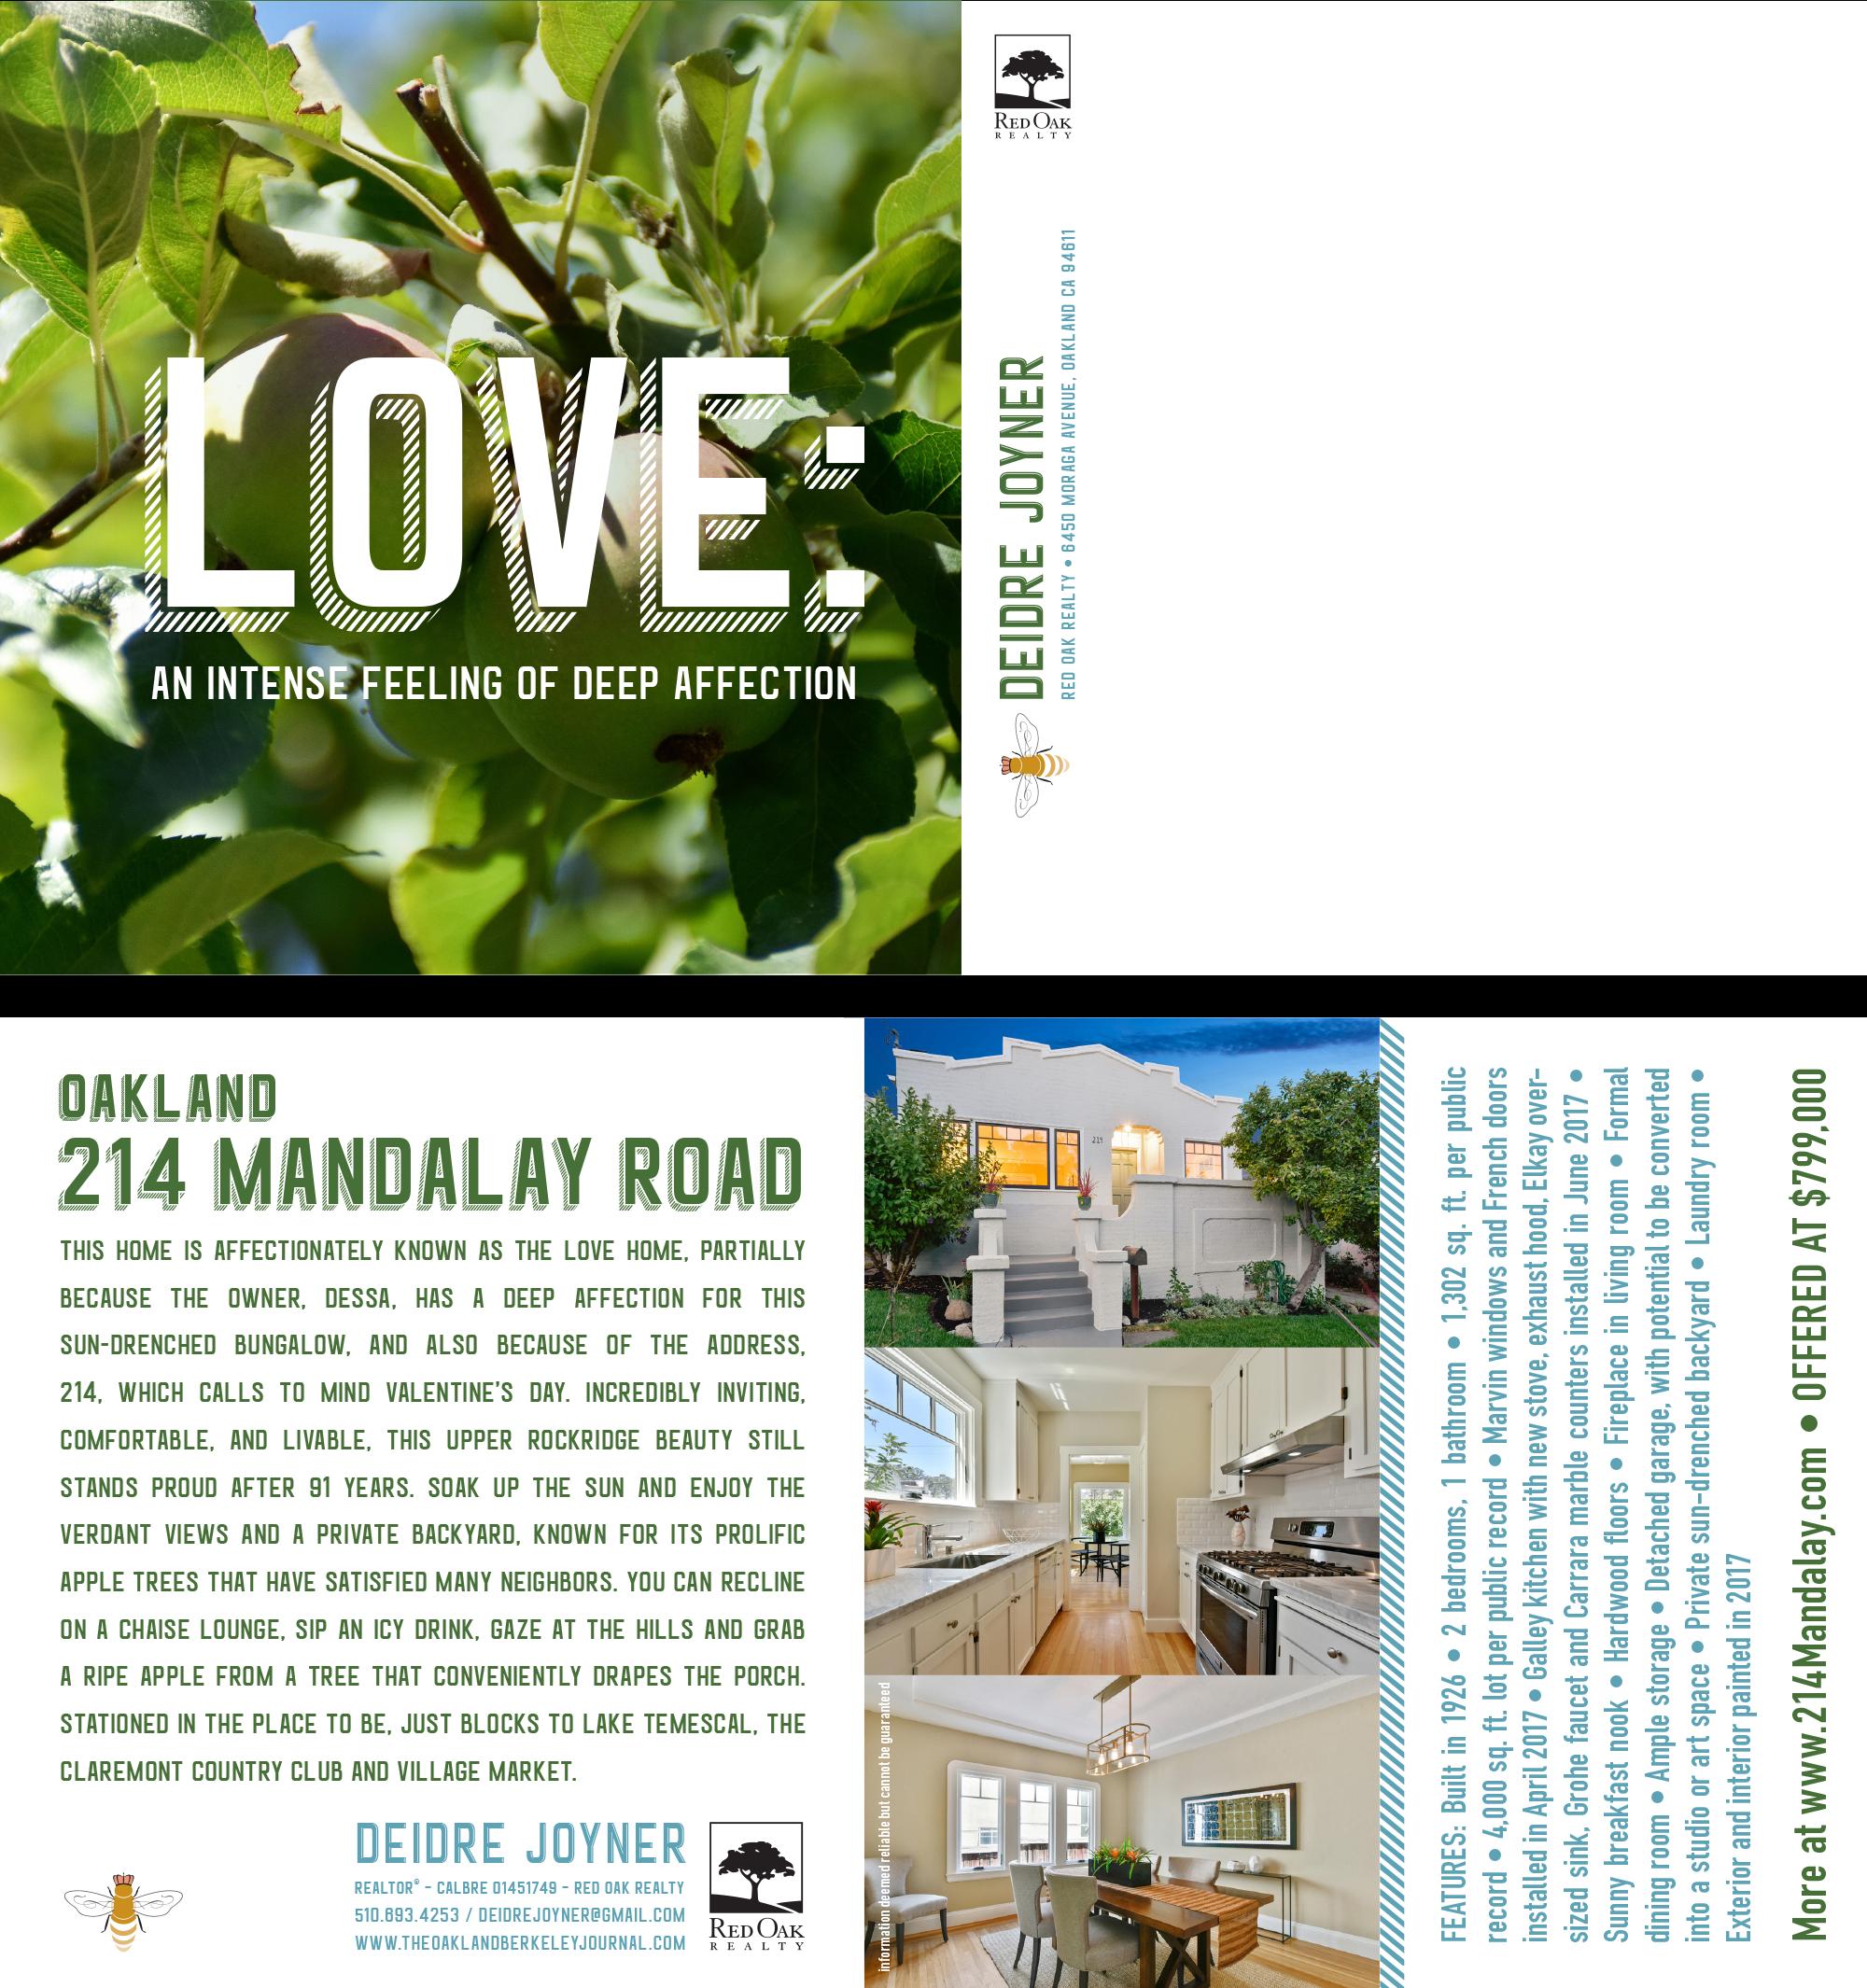 214 Mandalay Road, Oakland